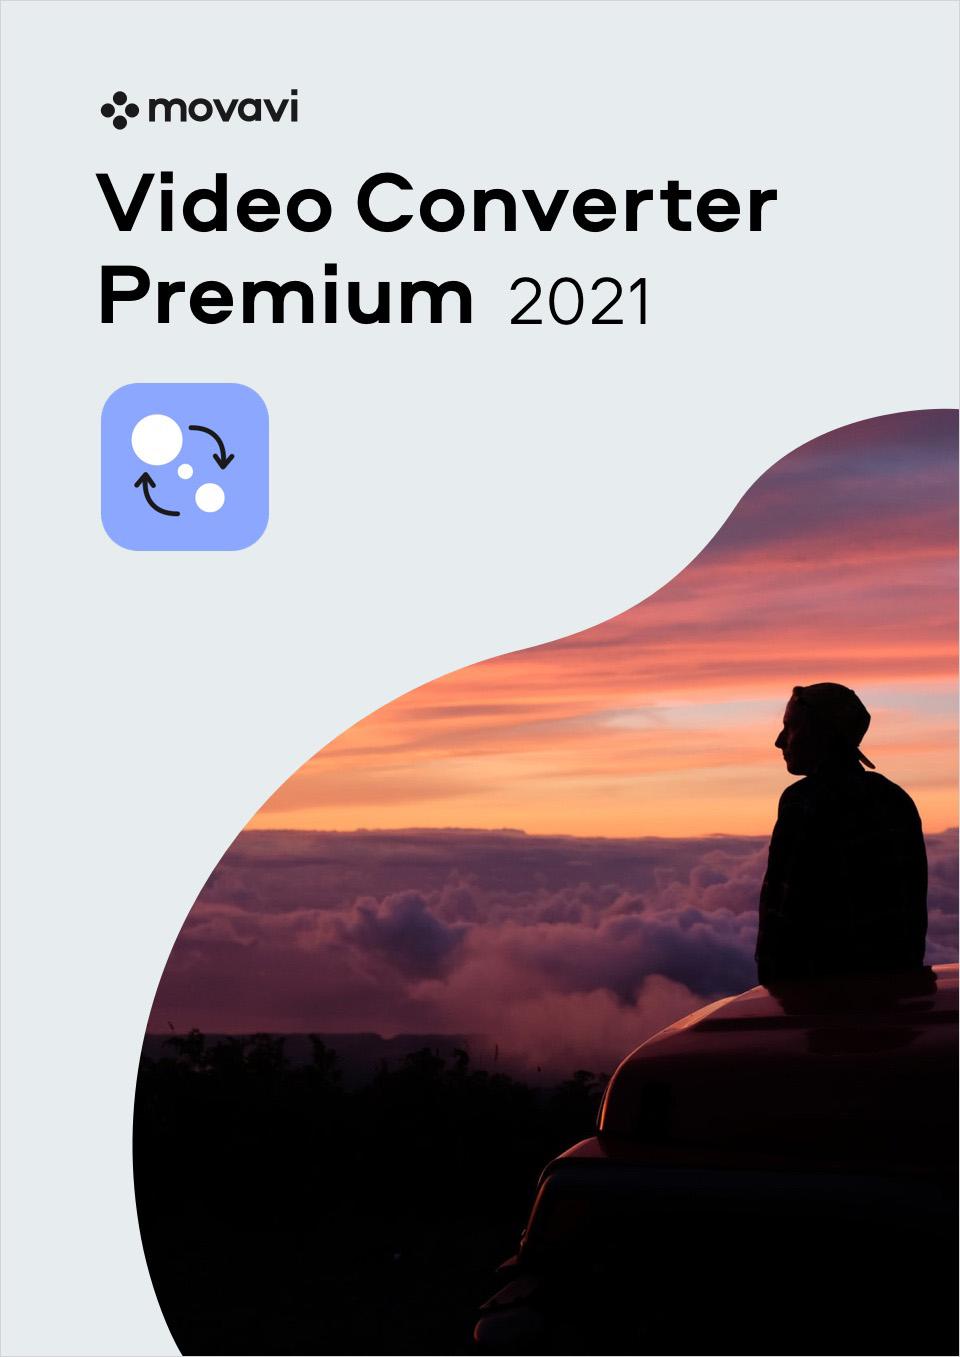 Movavi Конвертер Видео Премиум 2021. Бизнес лицензия [PC, Цифровая версия] (Цифровая версия)